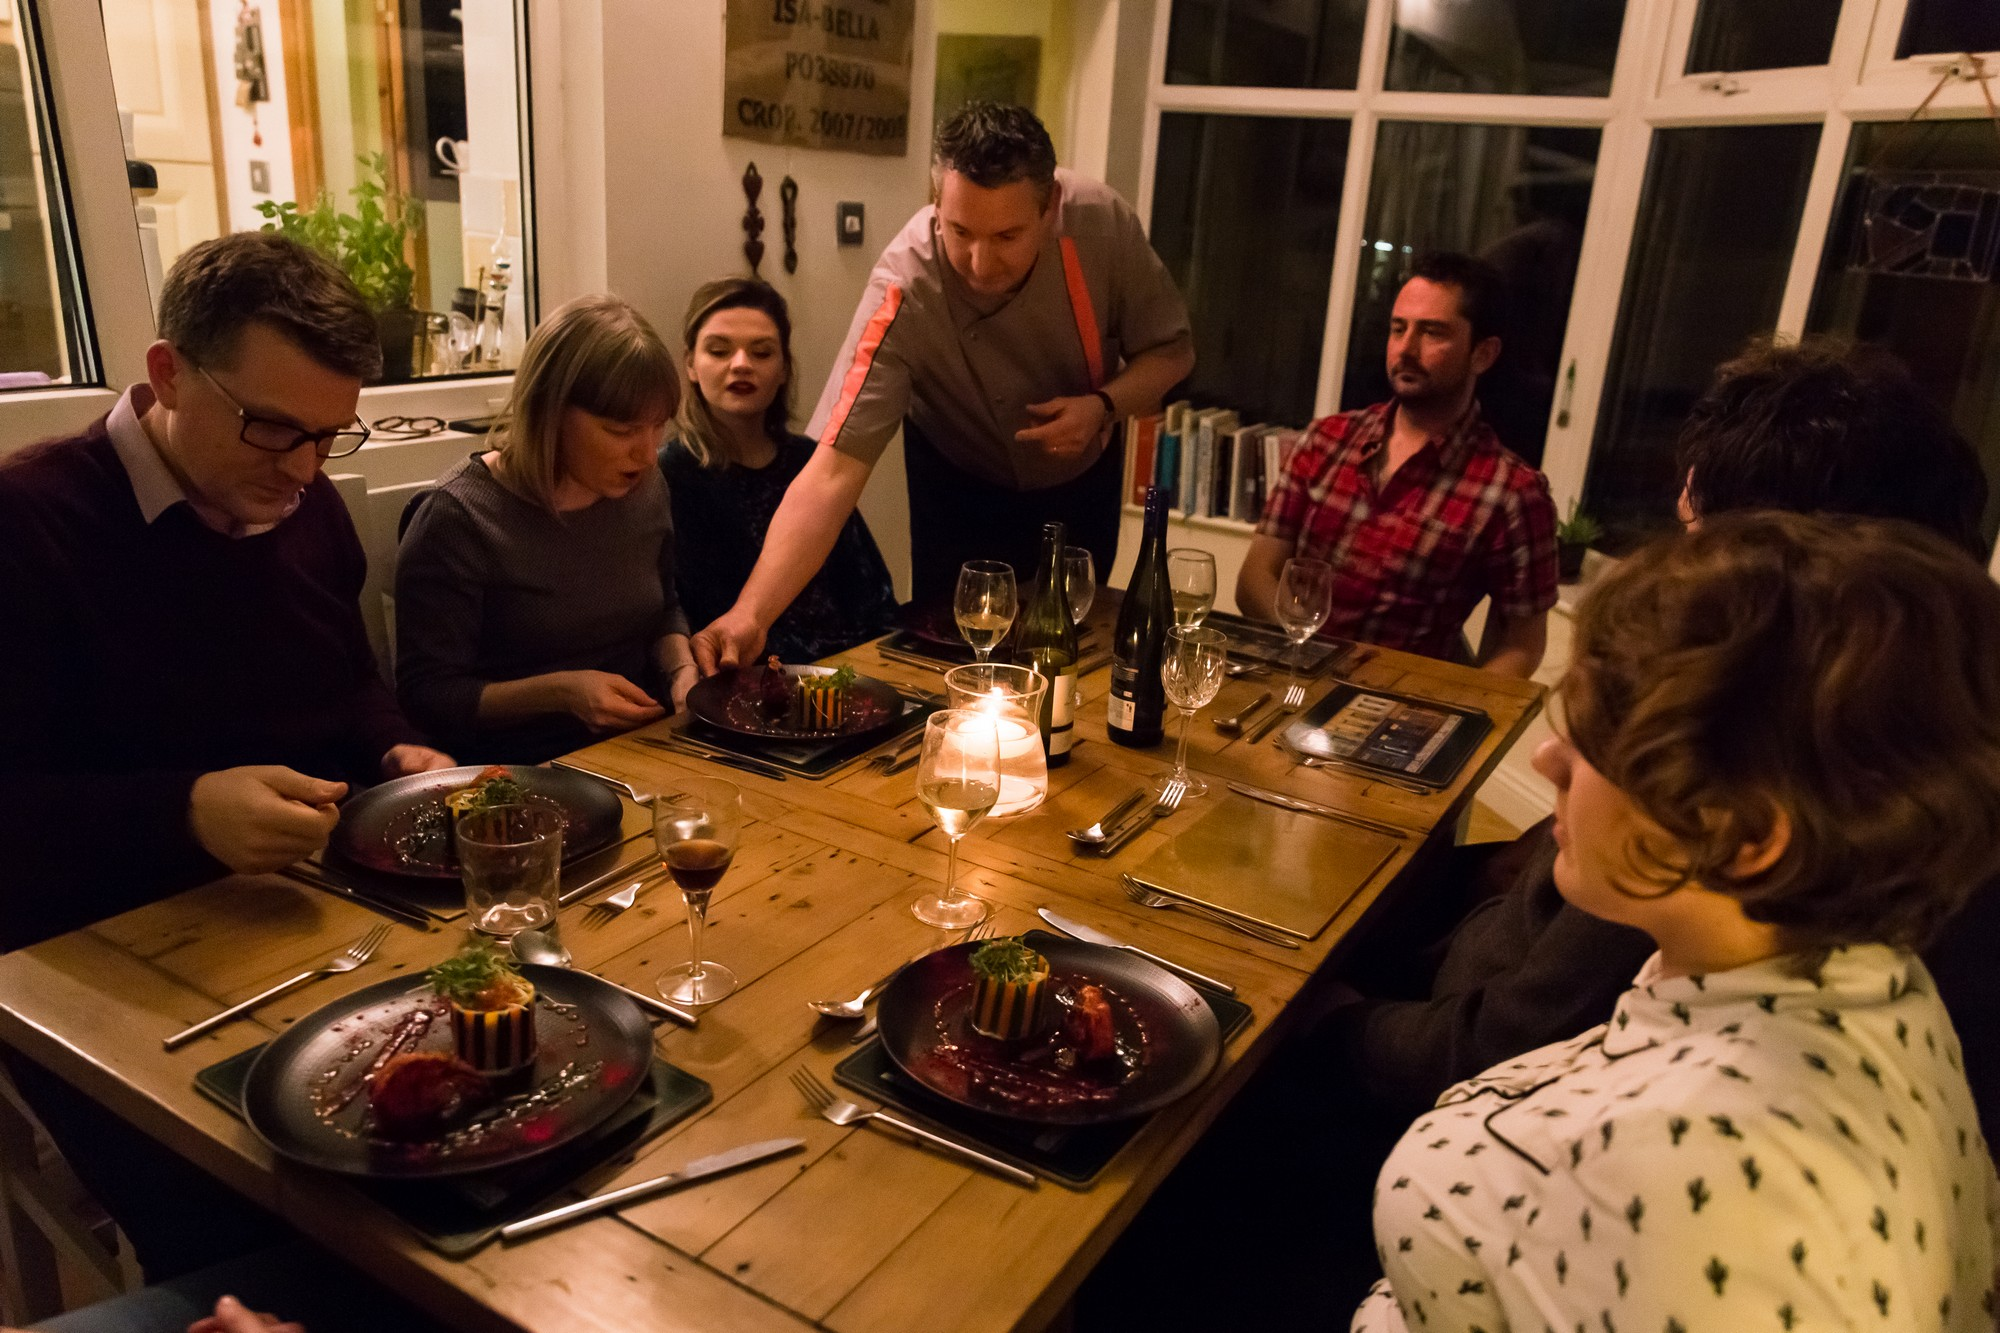 La Belle Assiette Private Dining